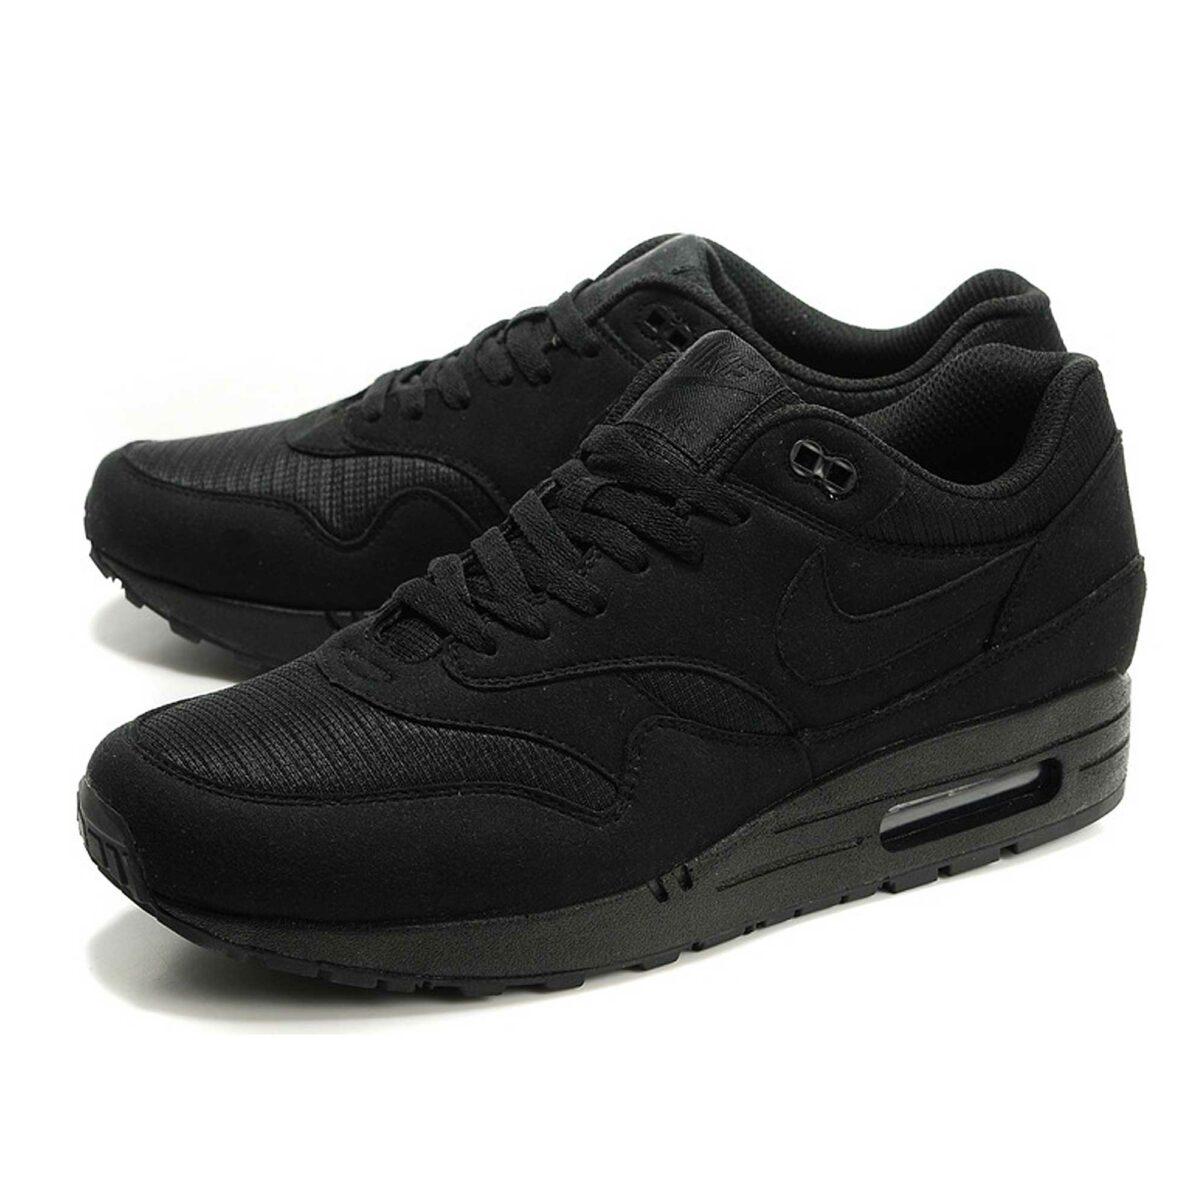 Интернет магазин Nike Air Max 1 87 Black